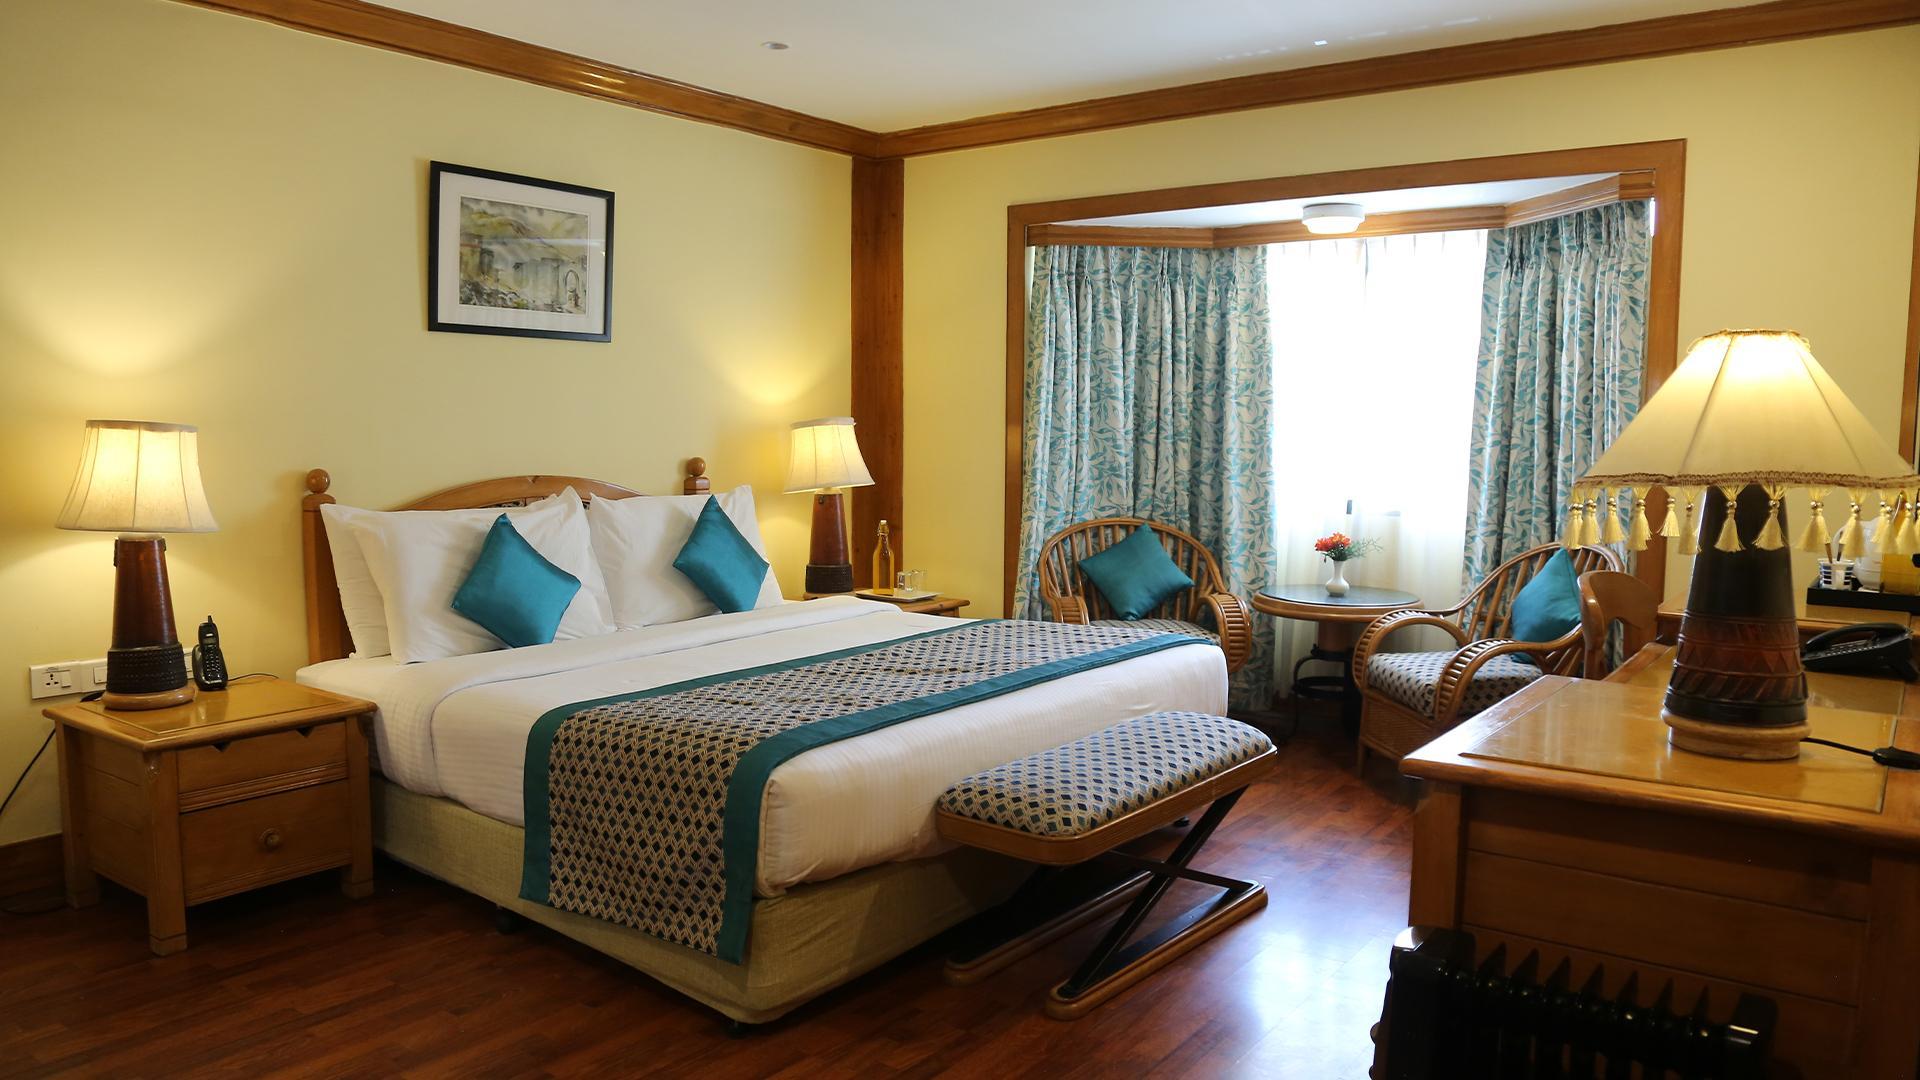 Suite image 1 at Fortune Resort Sullivan Court, Ooty by Nilgiris, Tamil Nadu, India